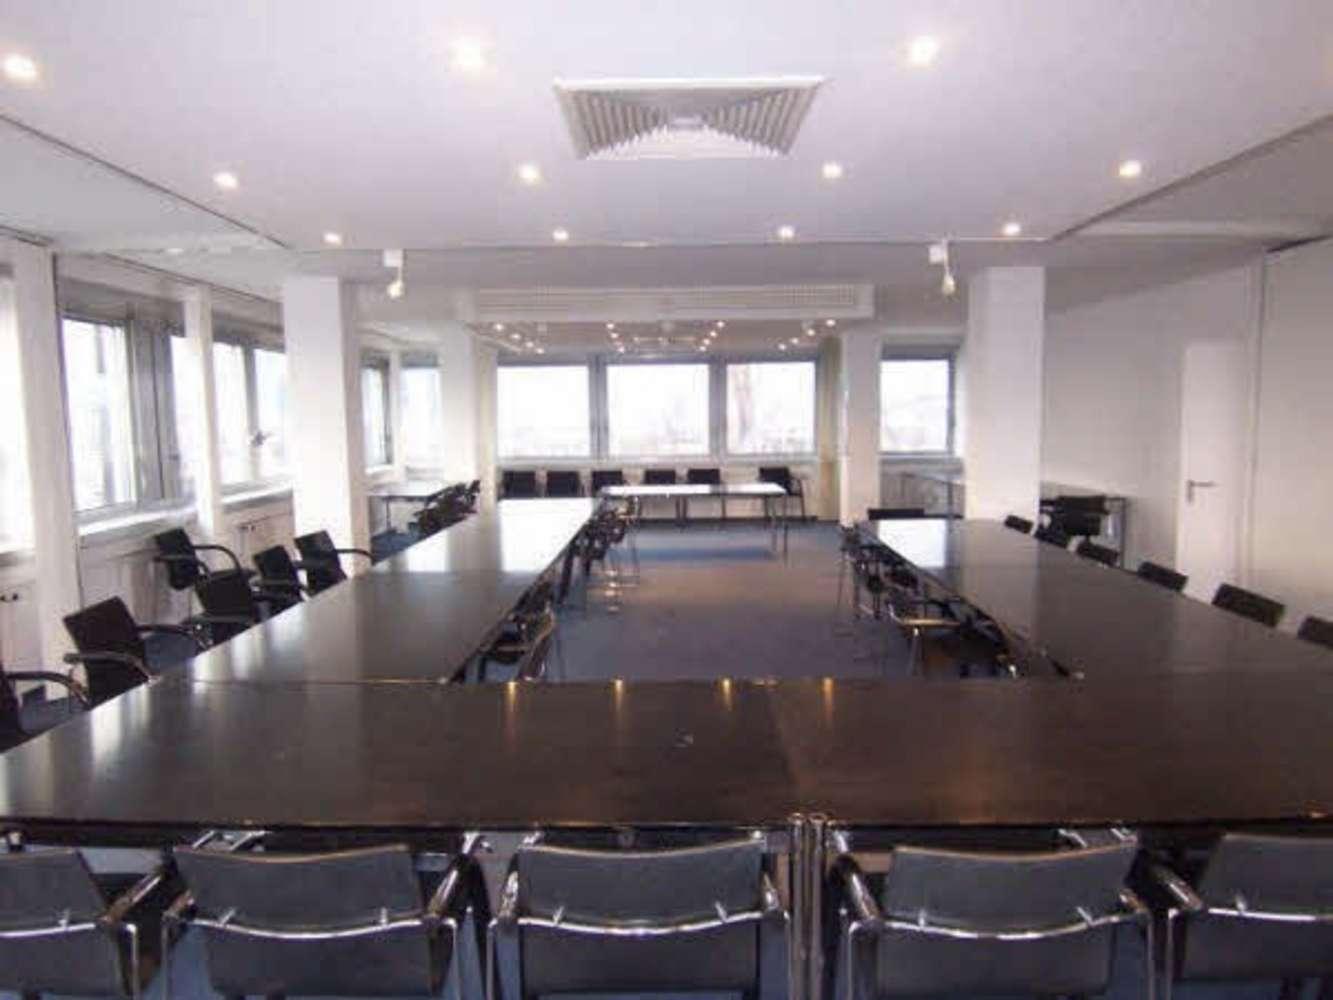 Büros Frankfurt am main, 60594 - Büro - Frankfurt am Main, Sachsenhausen - F0068 - 9641770